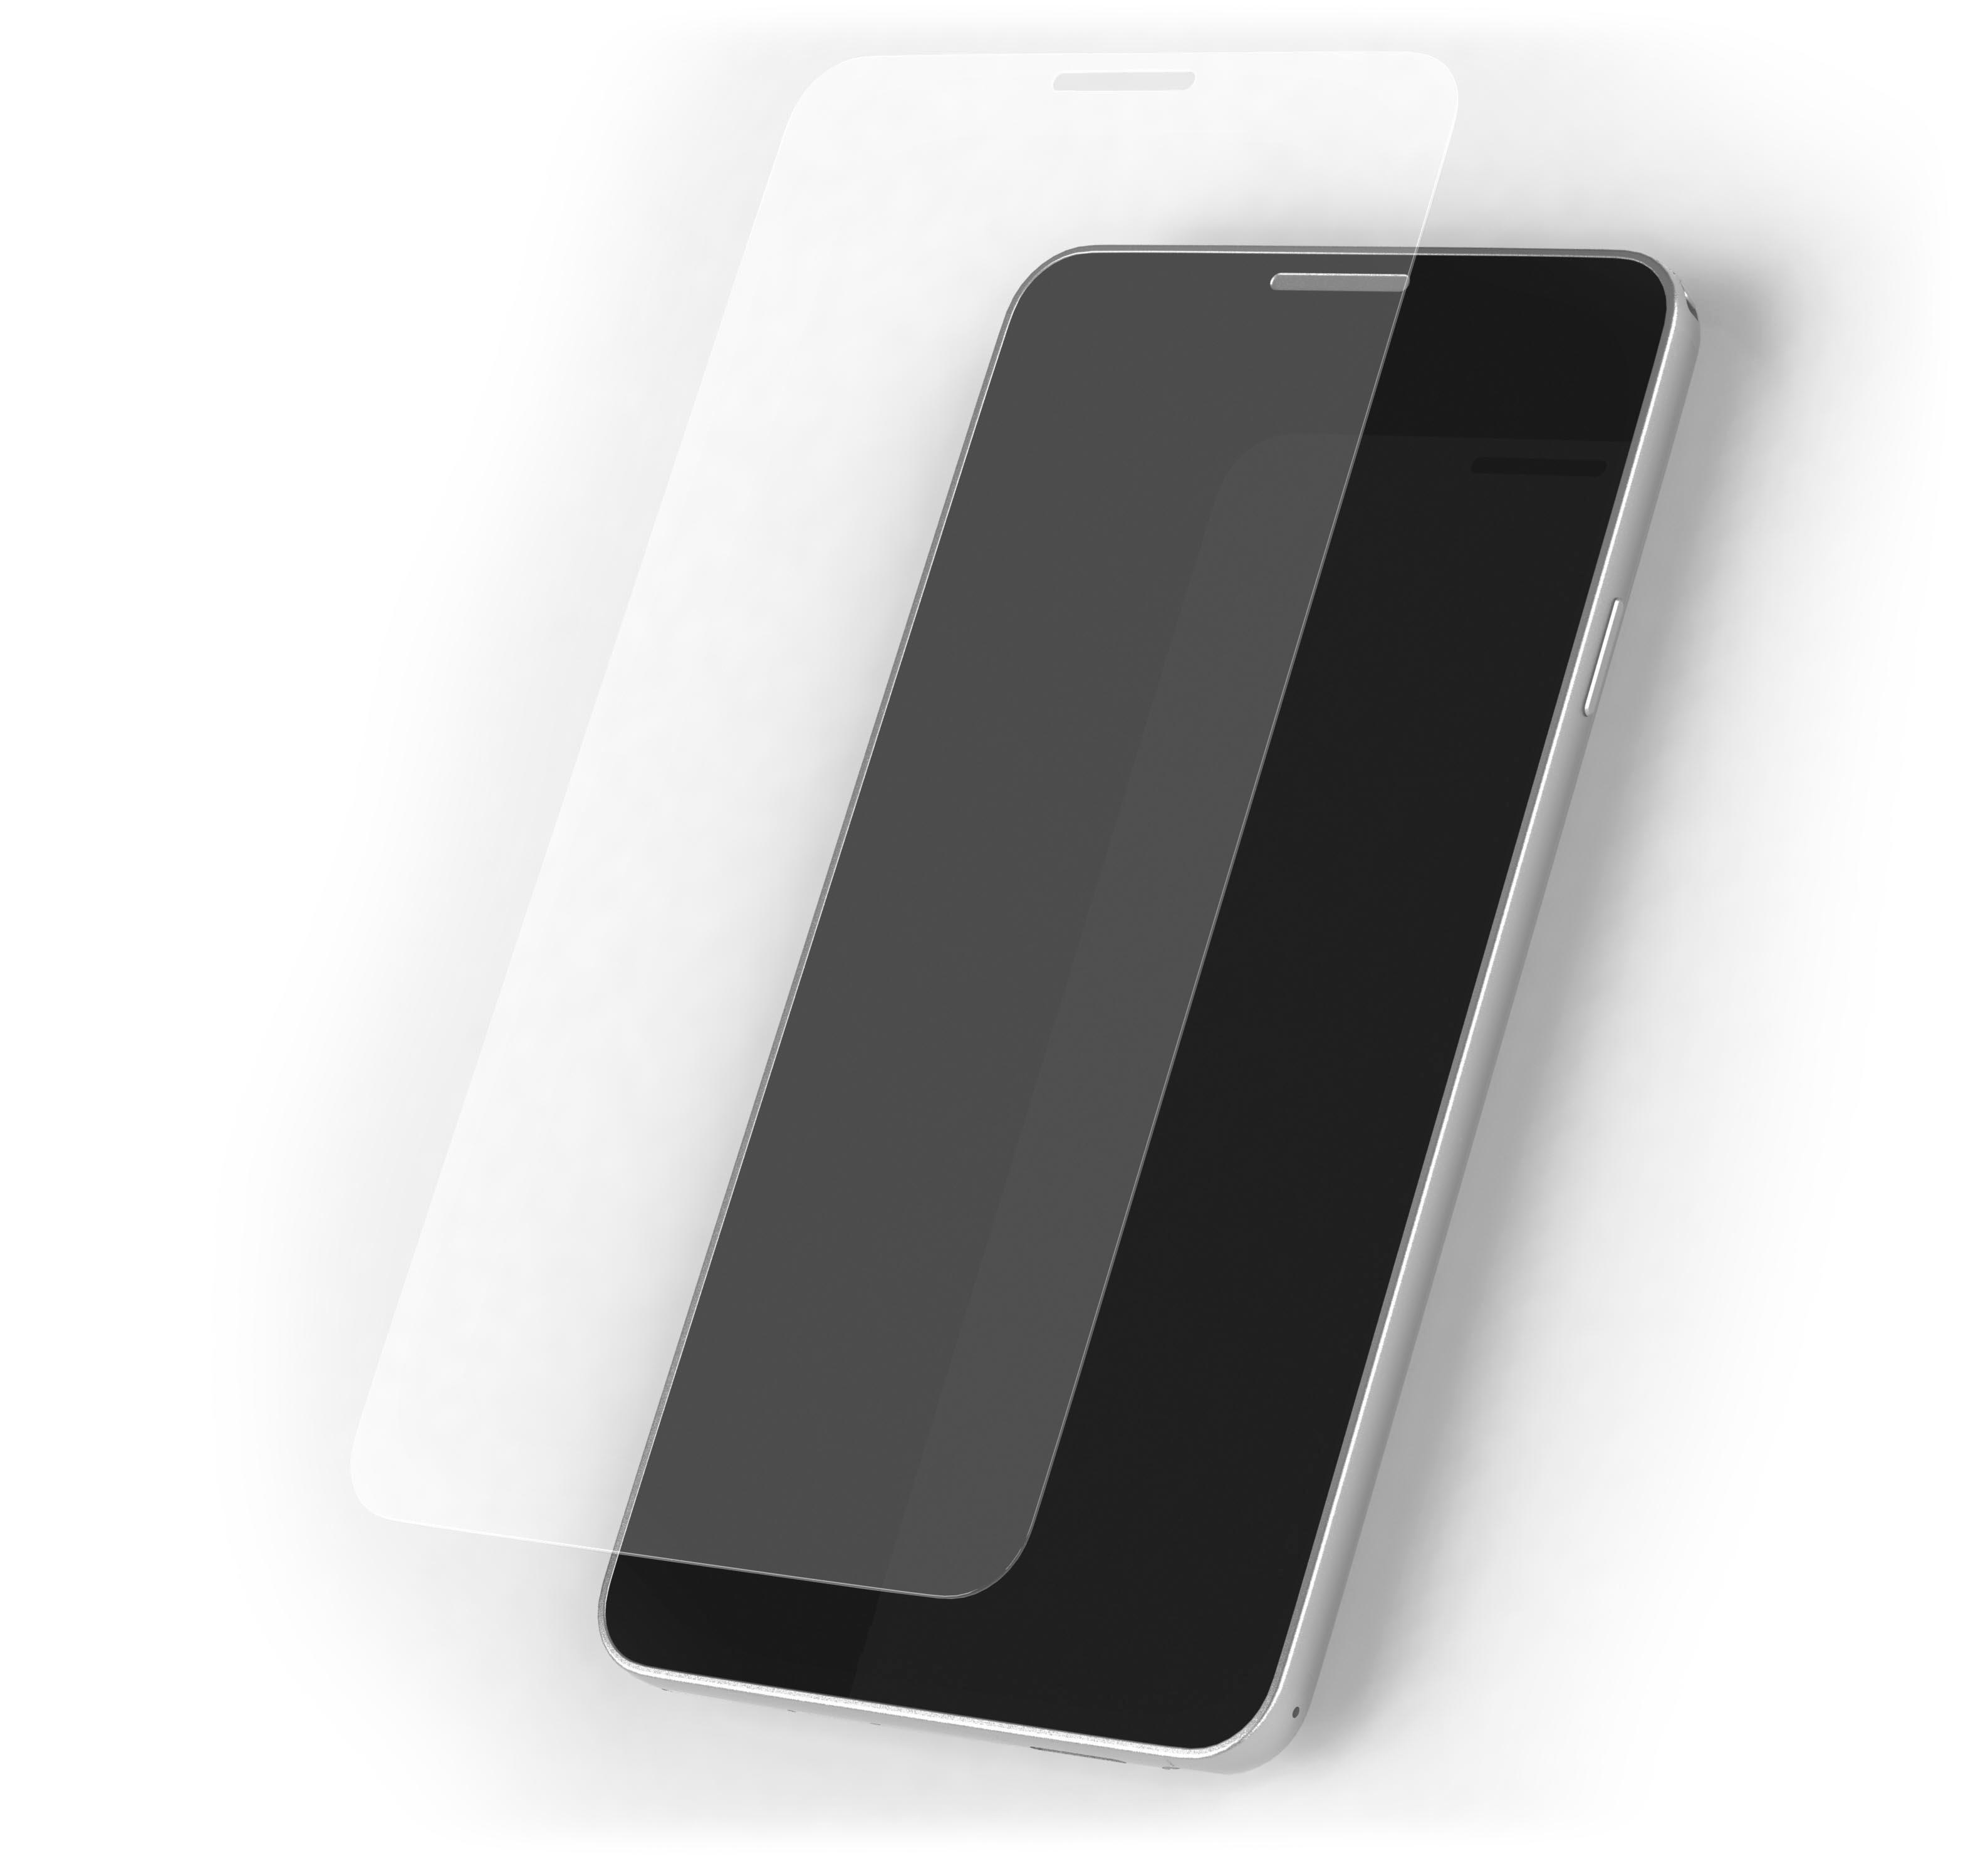 Patriot ochrana displeje pro Note 4 (3ks)Anti-Glare s úpravou proti lesku